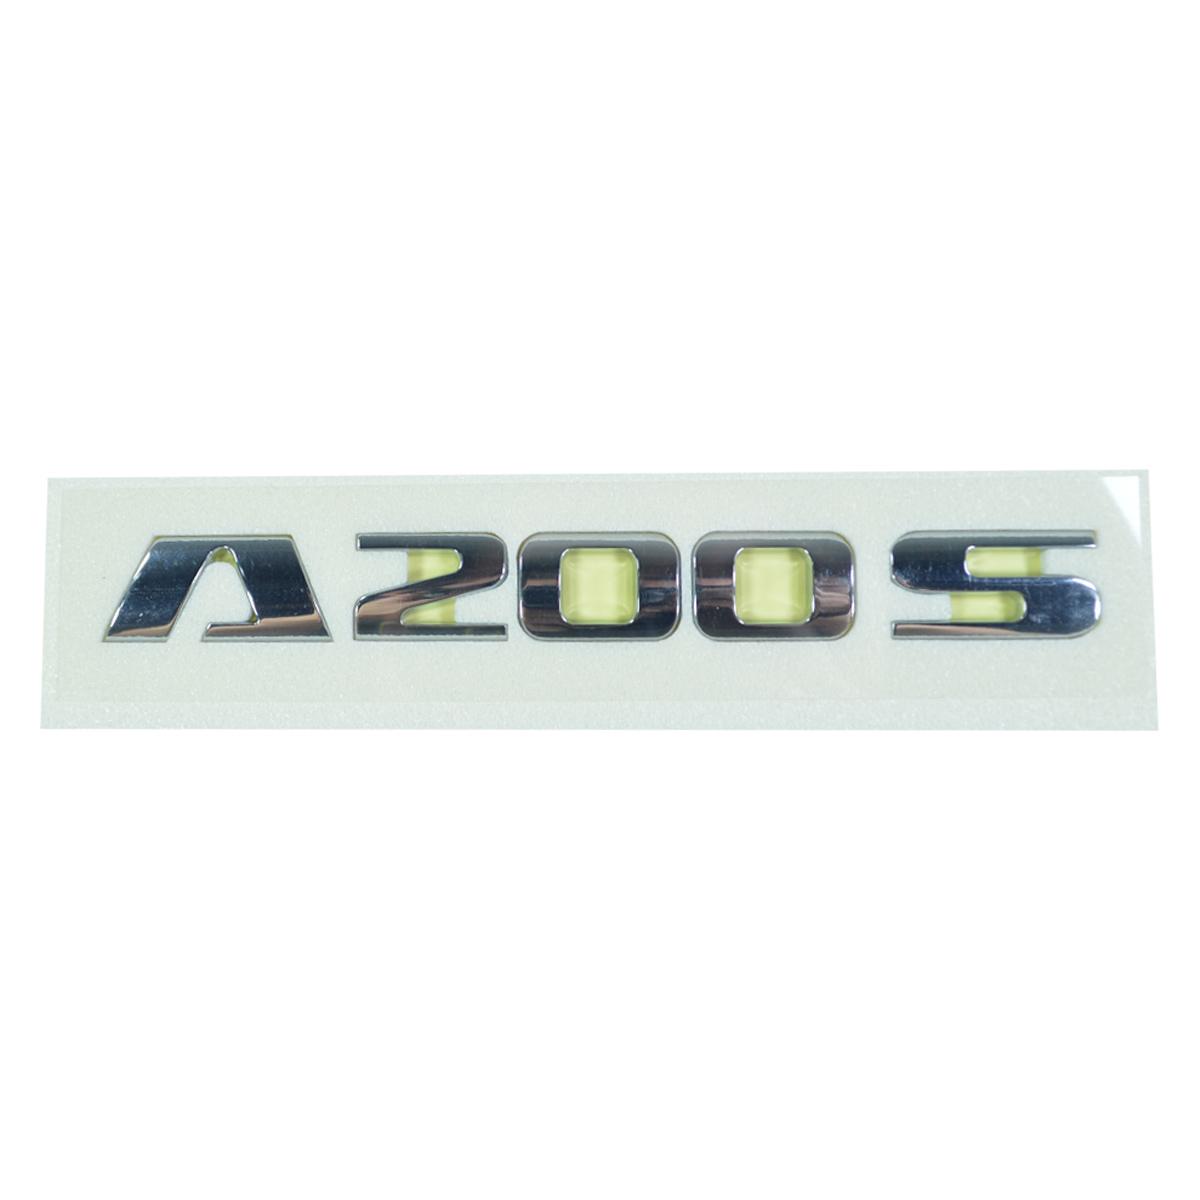 EMBLEMA PORTA DIANTEIRA A200S SSANGYONG ACTYON SPORTS 2.0 APÓS 2008